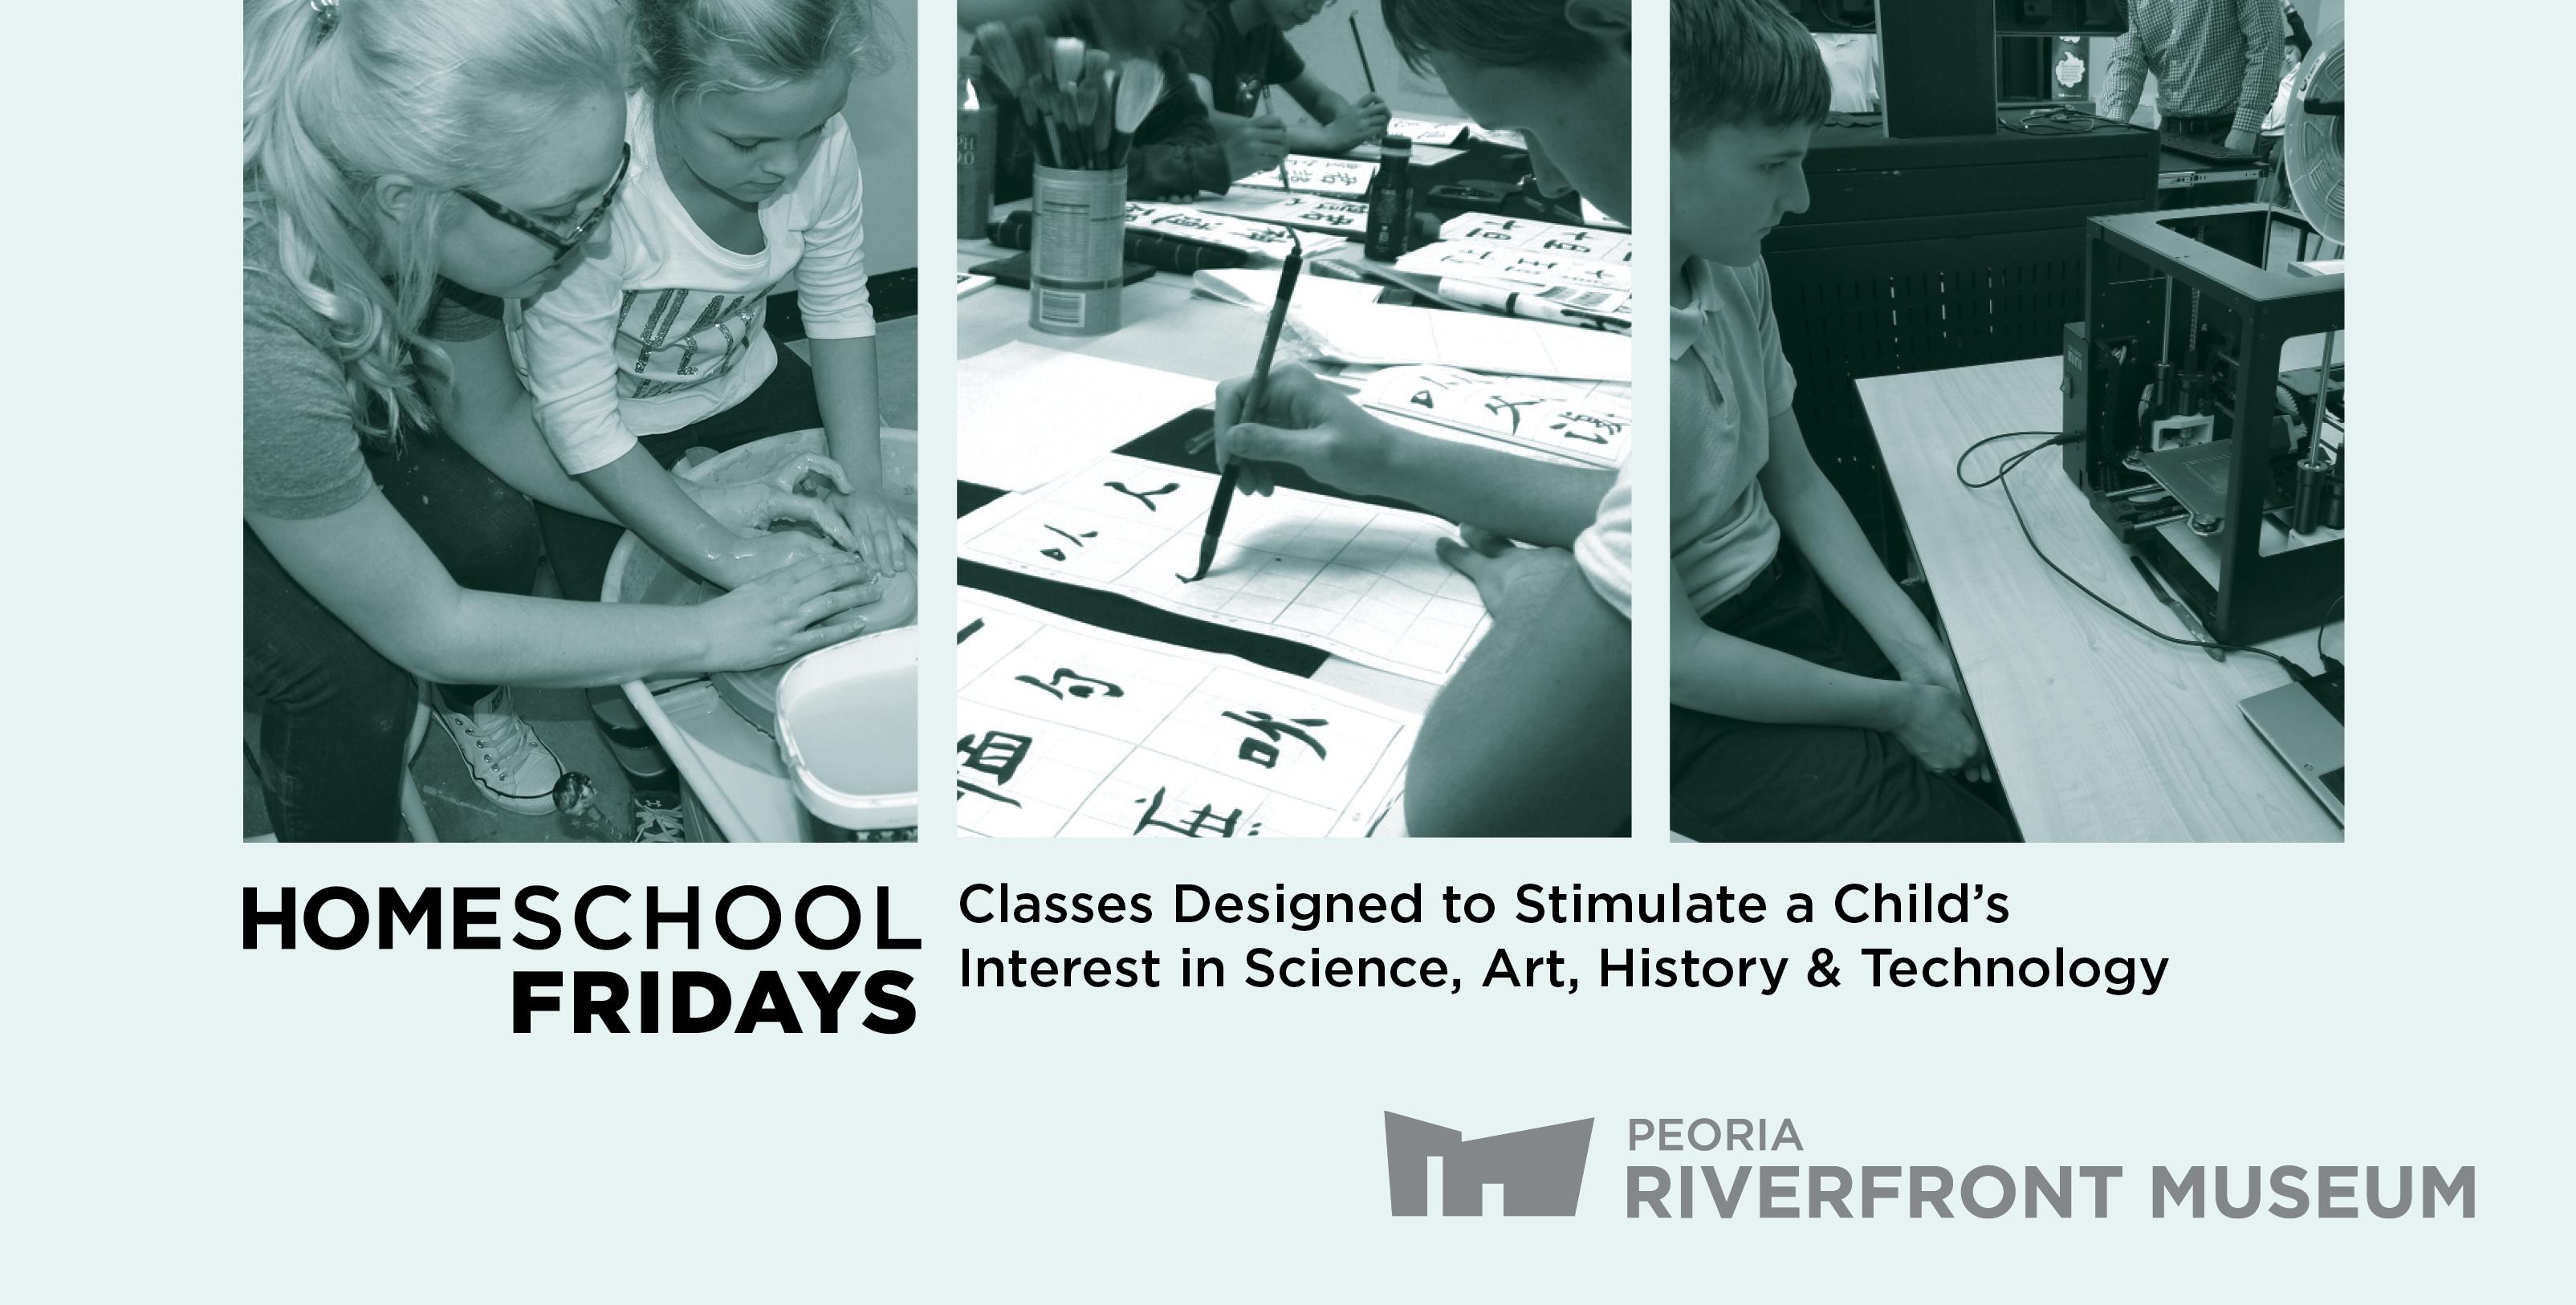 Classes | Programs - Homeschool Fridays - Peoria Riverfront